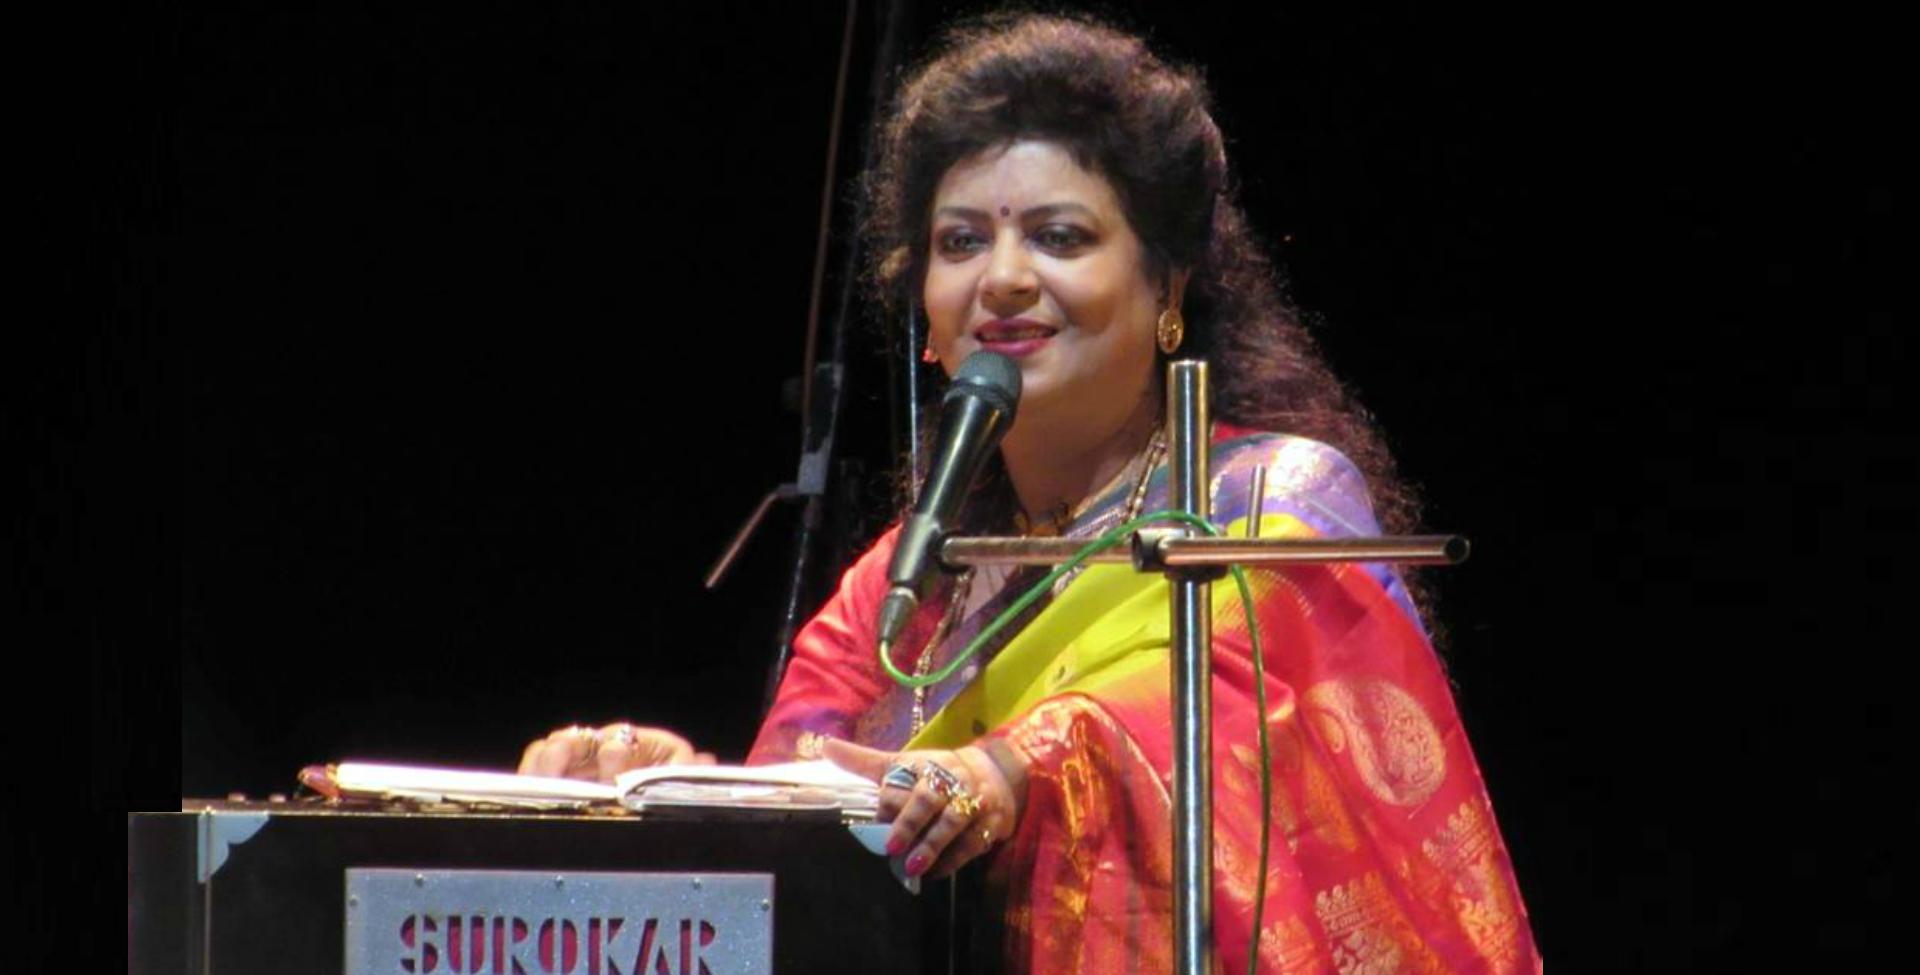 Chandrabali Rudra Dutta